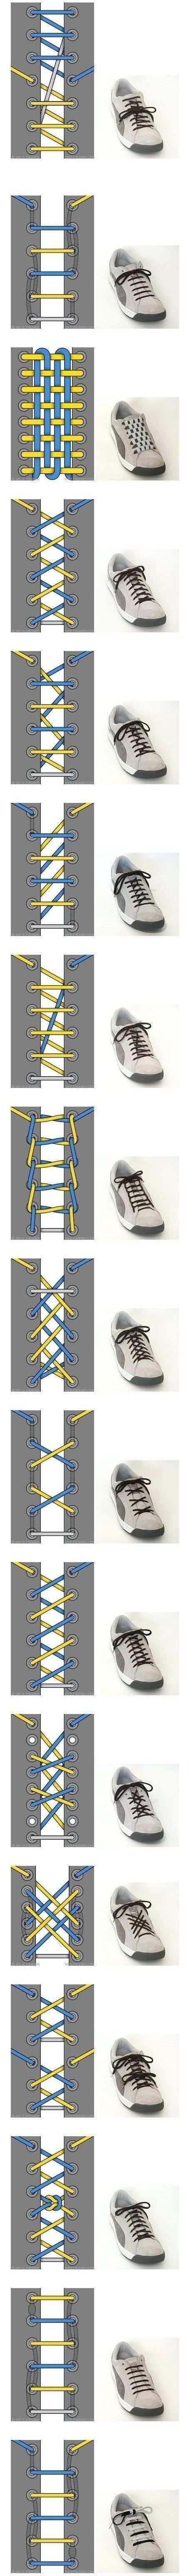 Shoelaceing Schuhbander Schnursenkel Muster Schuhe Binden